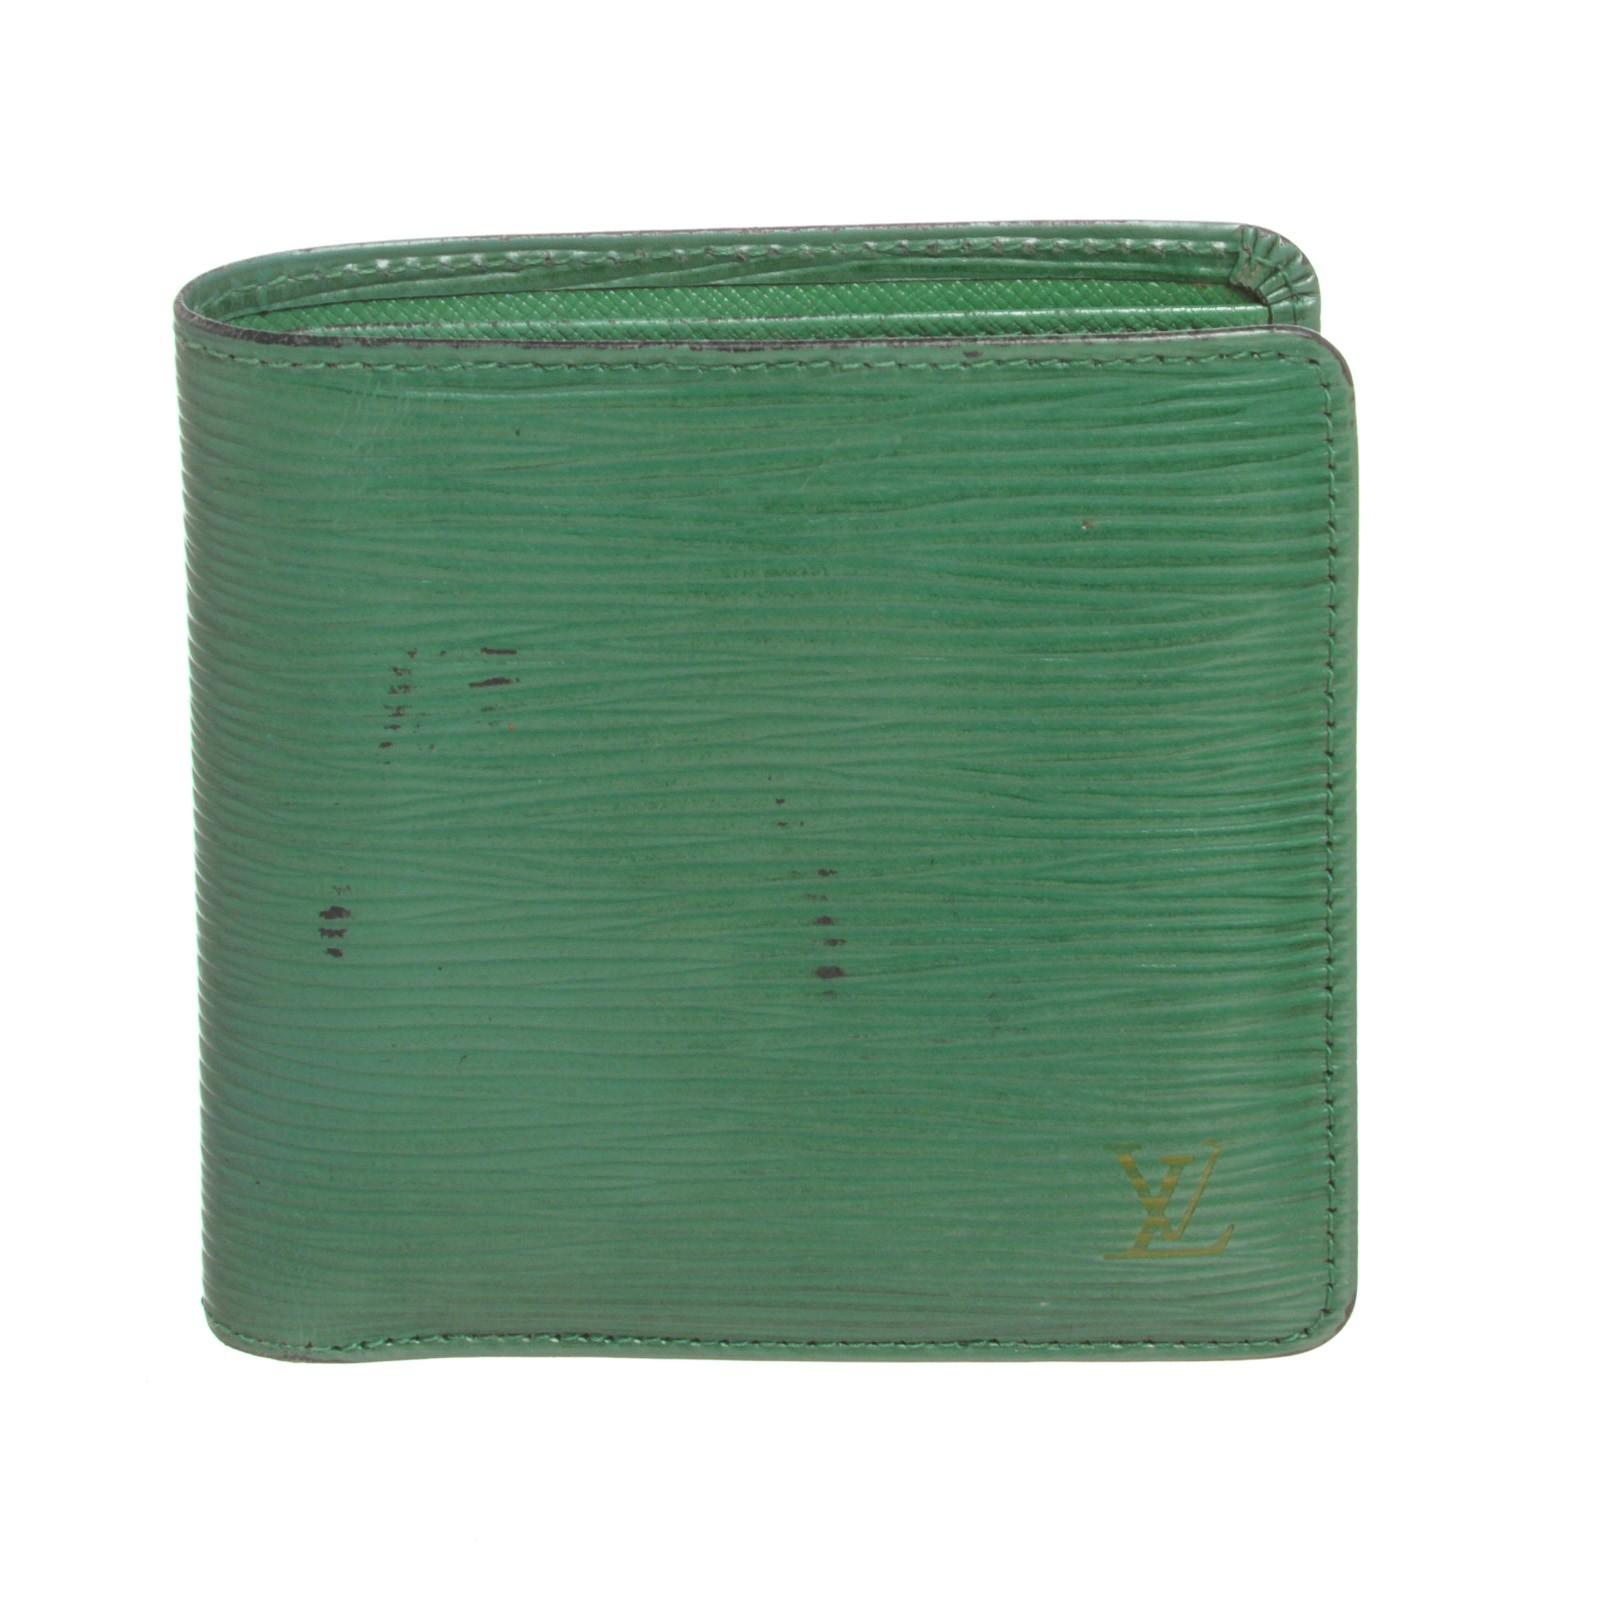 Shop for Louis Vuitton Green Epi Leather Marco Mens Wallet - Shipped ... d39a5d7a1